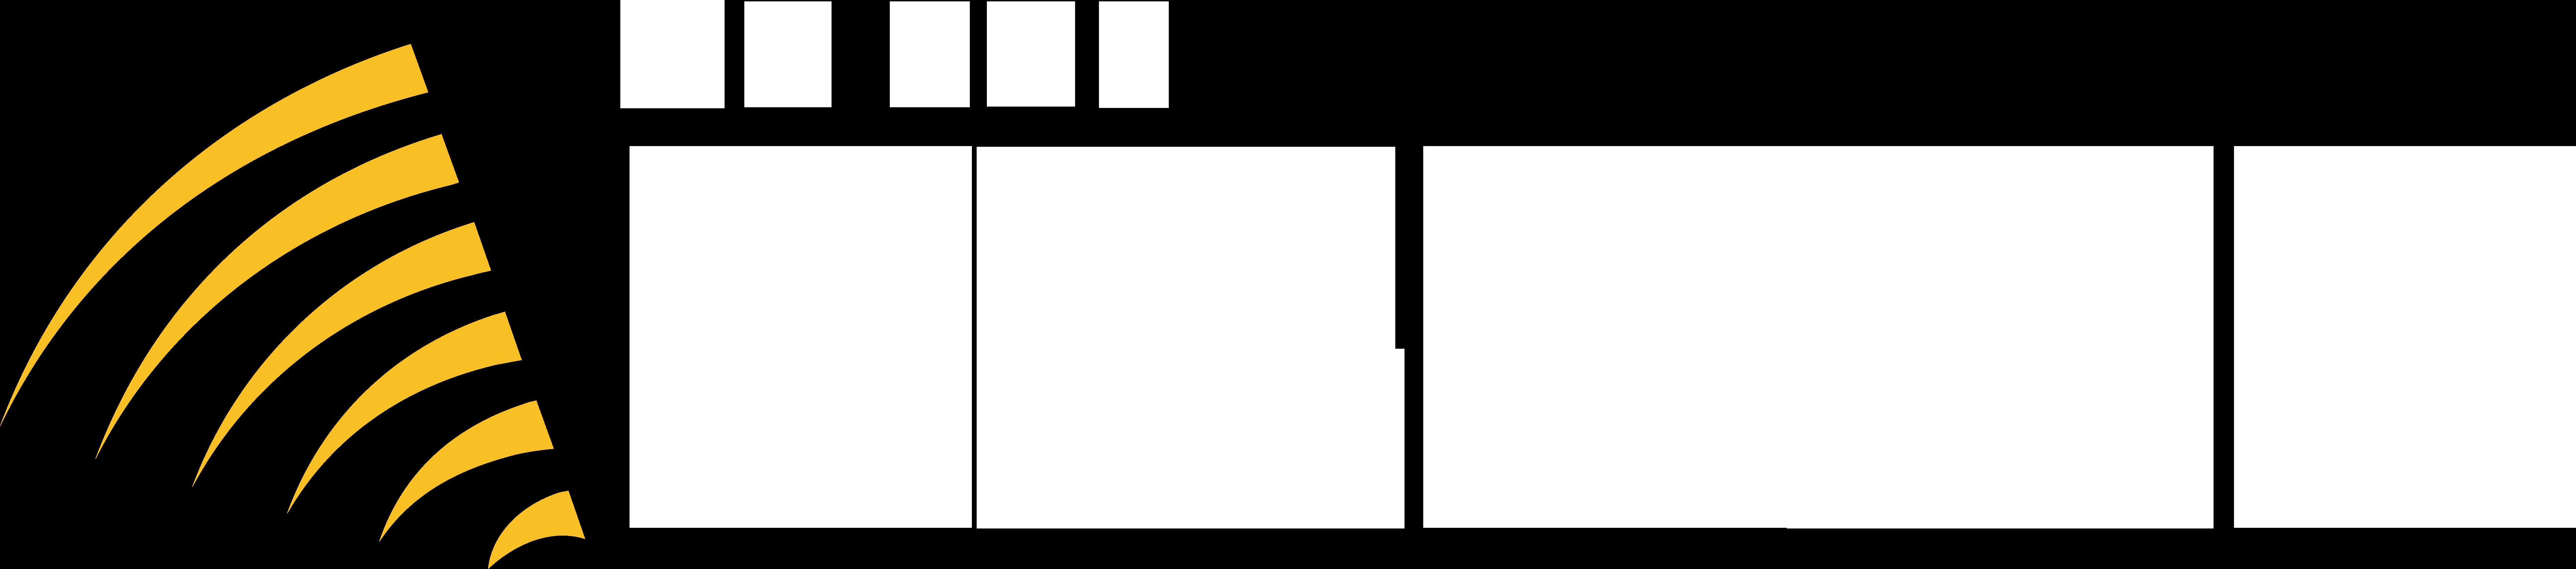 On The Radar Aviation Newsletter